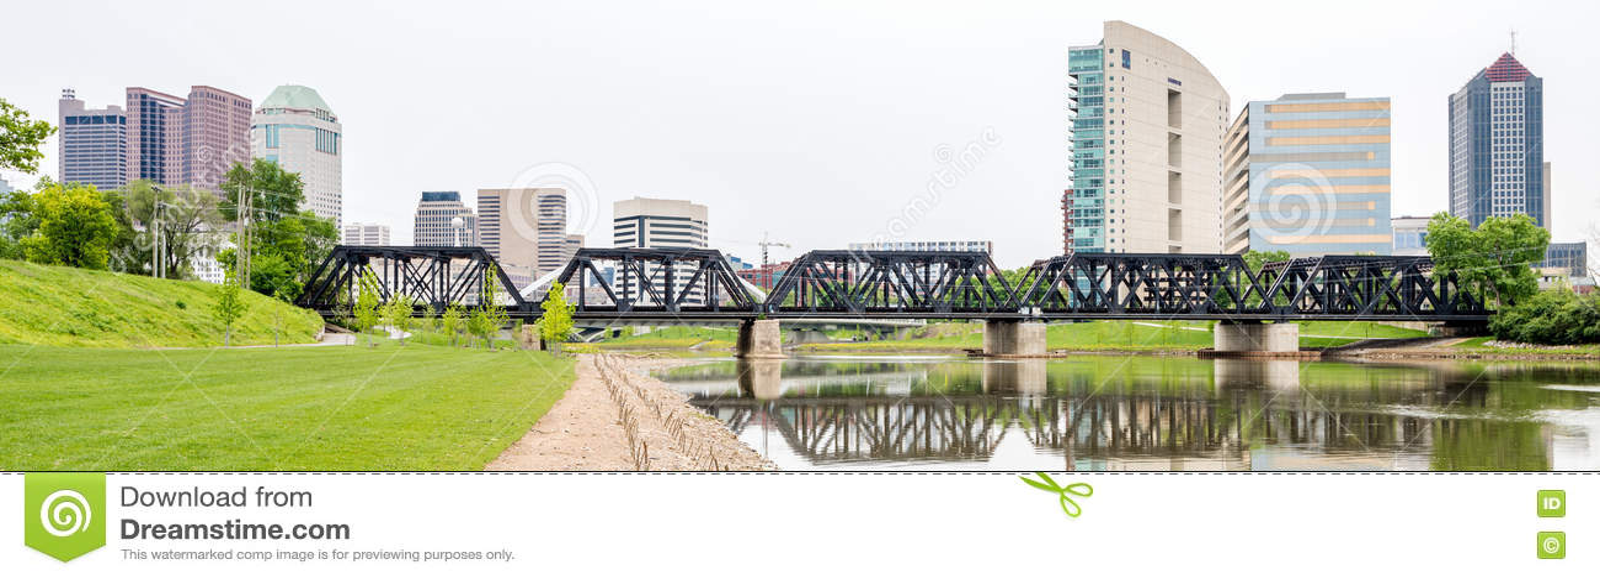 Train tracks over the river and Columbus Ohio skyline